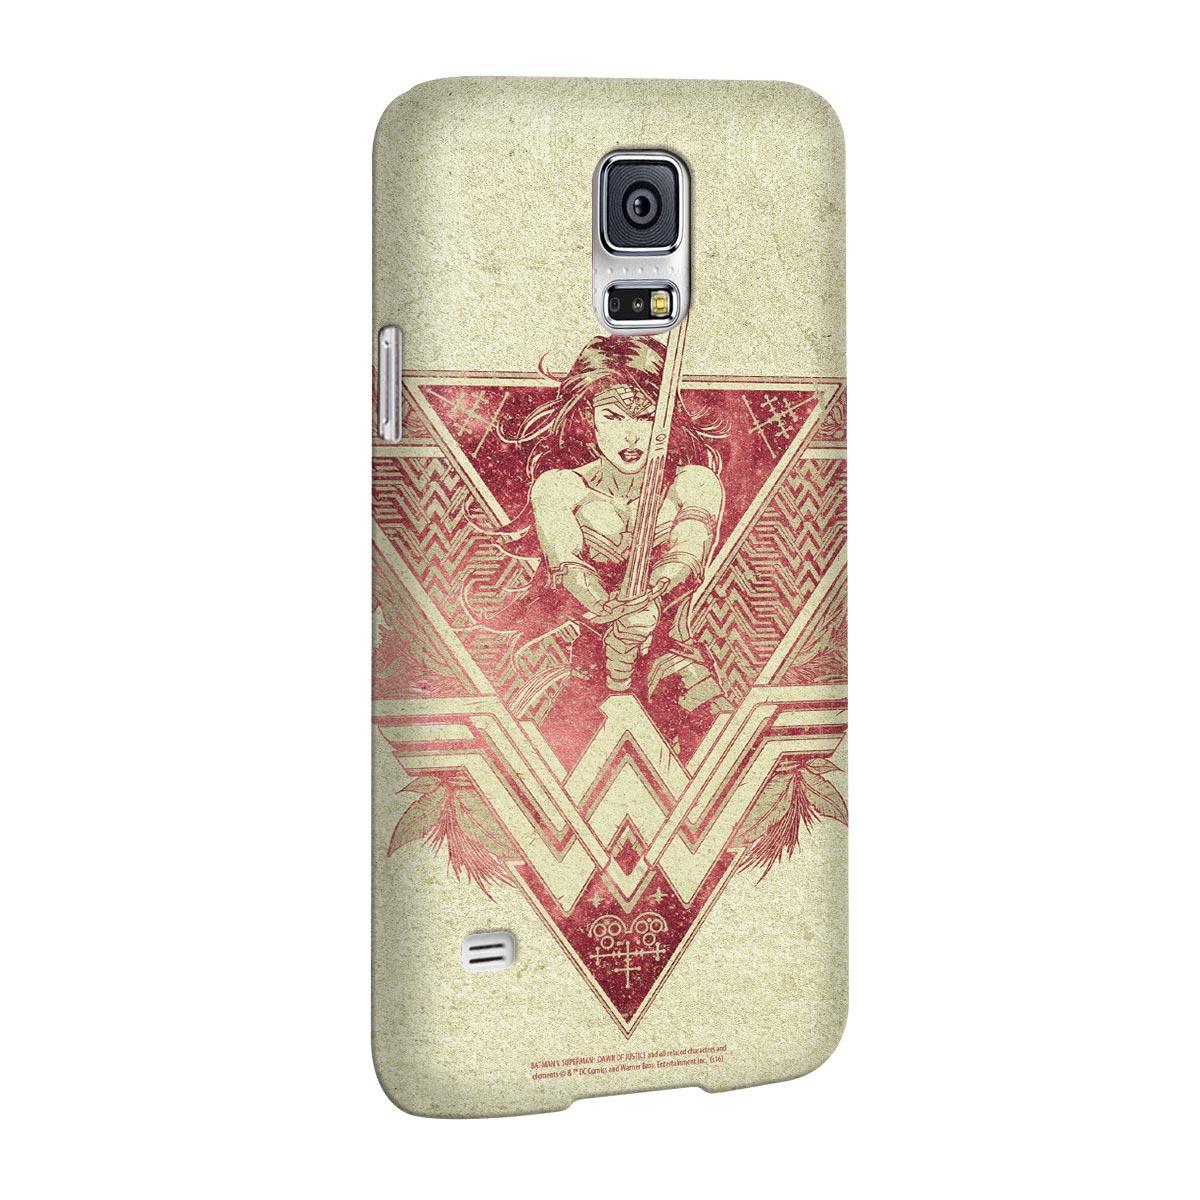 Capa para Samsung Galaxy S5 Wonder Woman Warrior